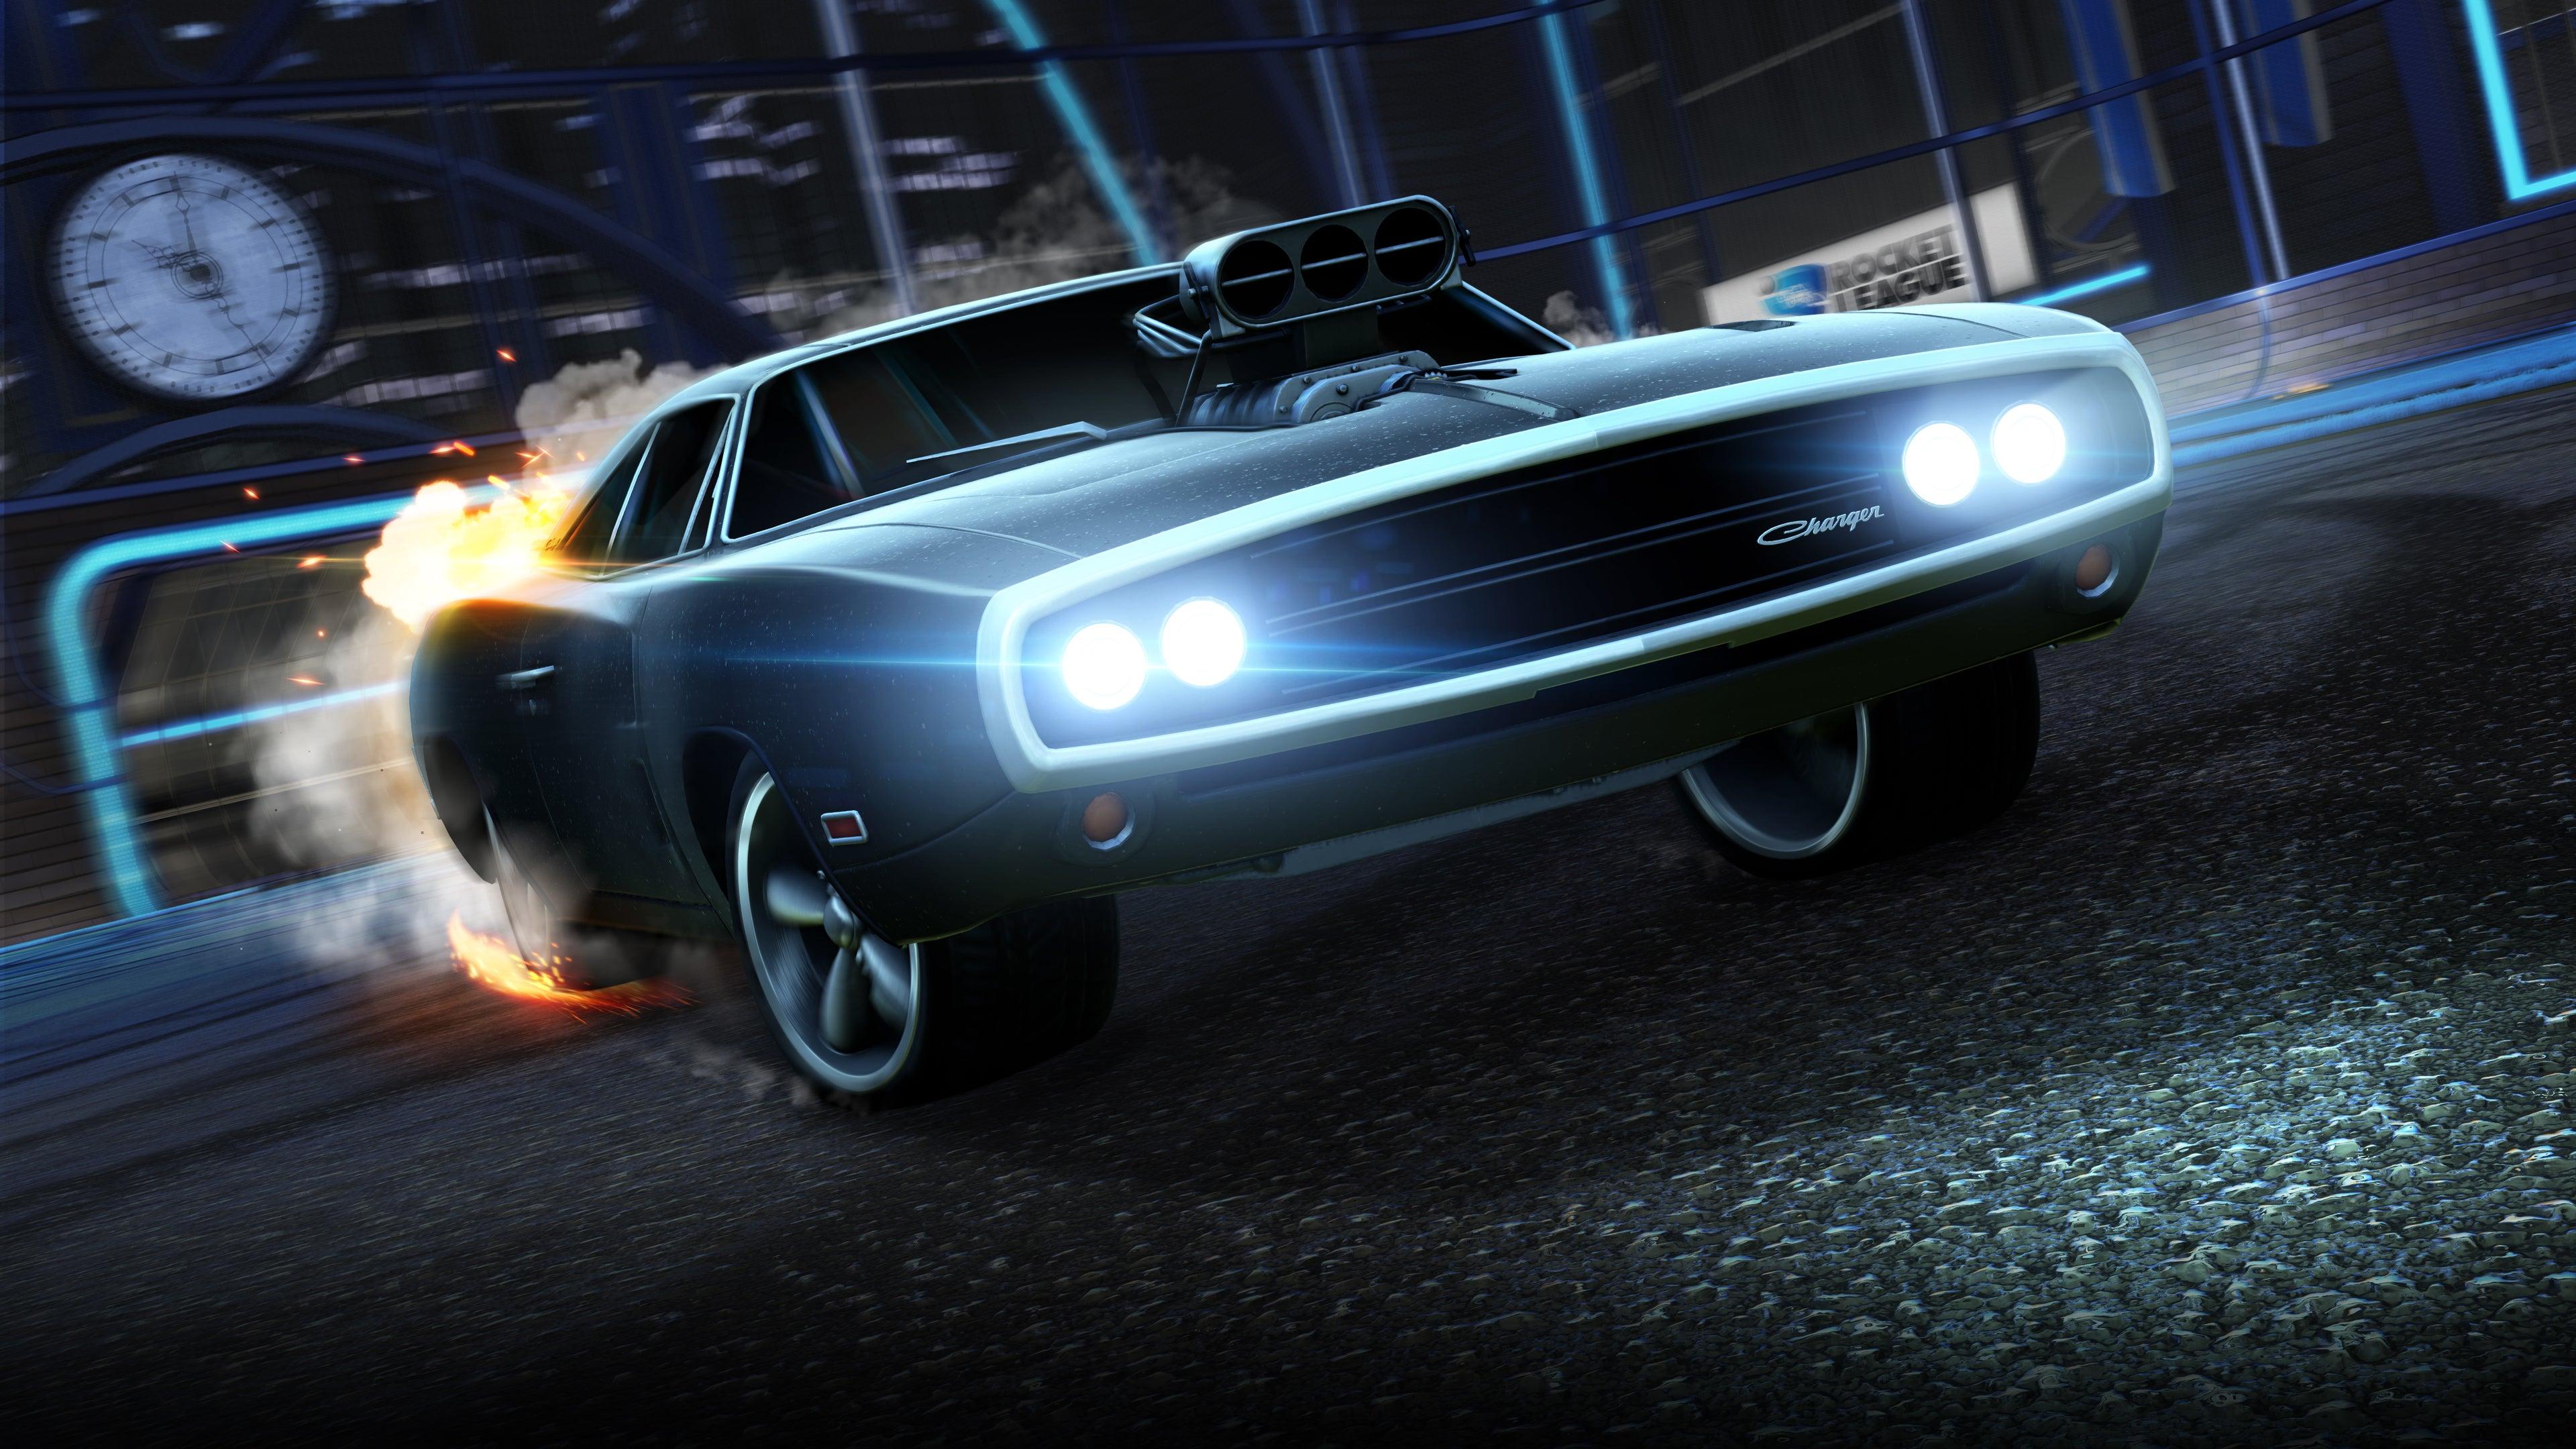 Annunciata la Data del nuovo DLC! | Rocket League